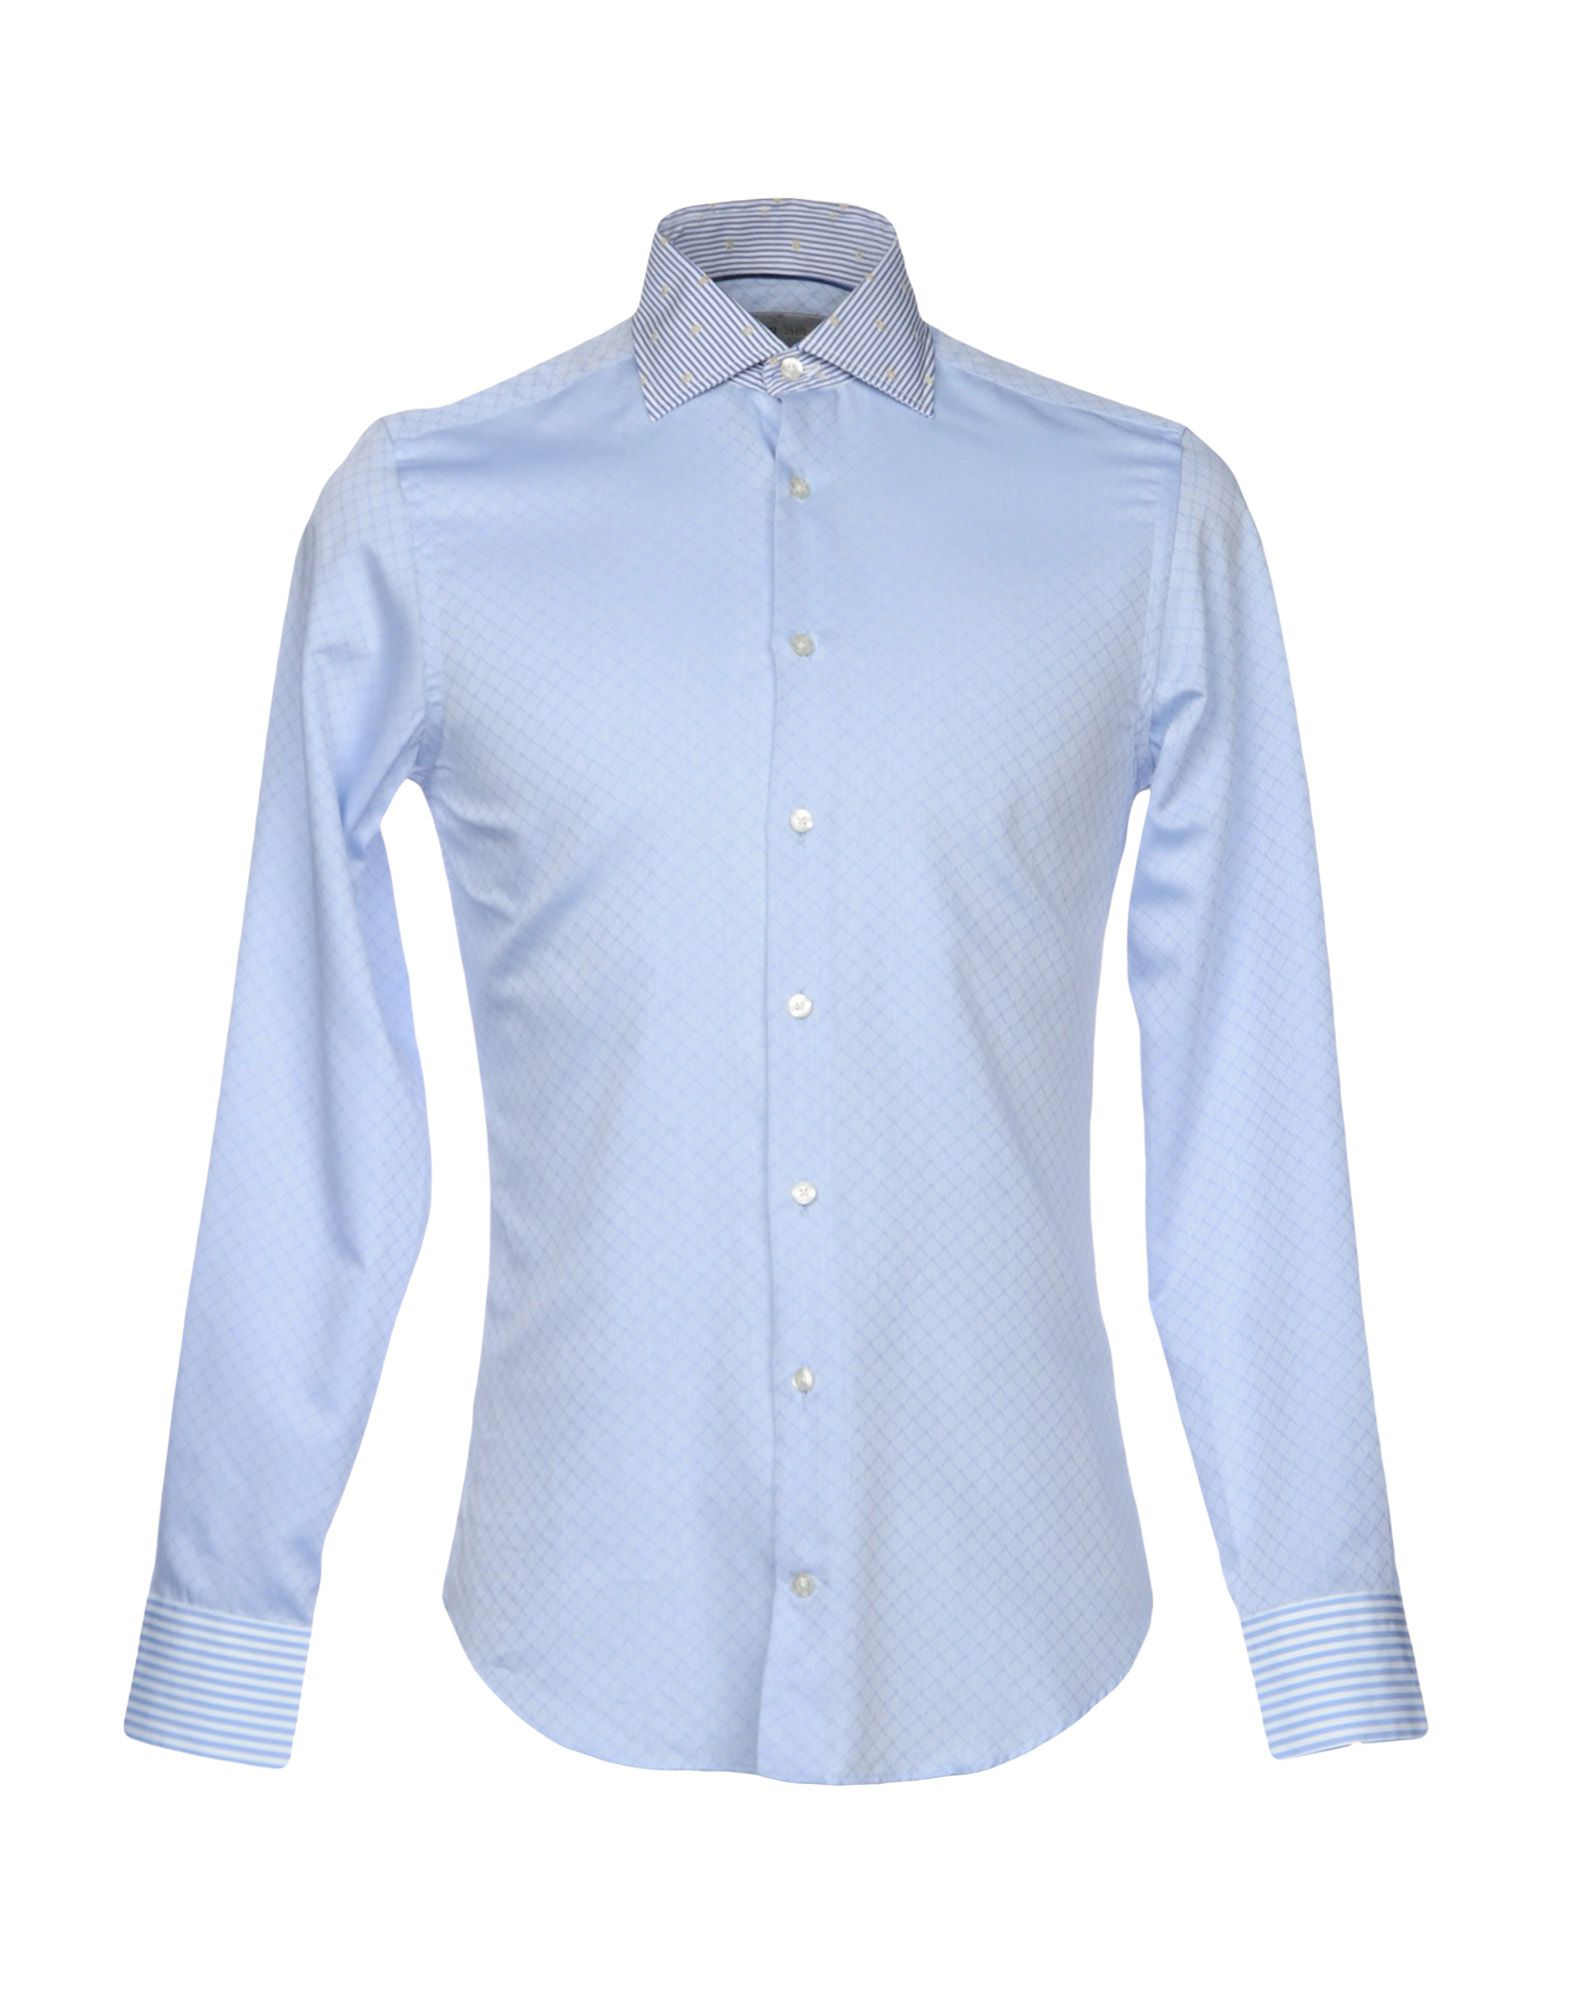 ETRO Herren Hemd Farbe Himmelblau Größe 3